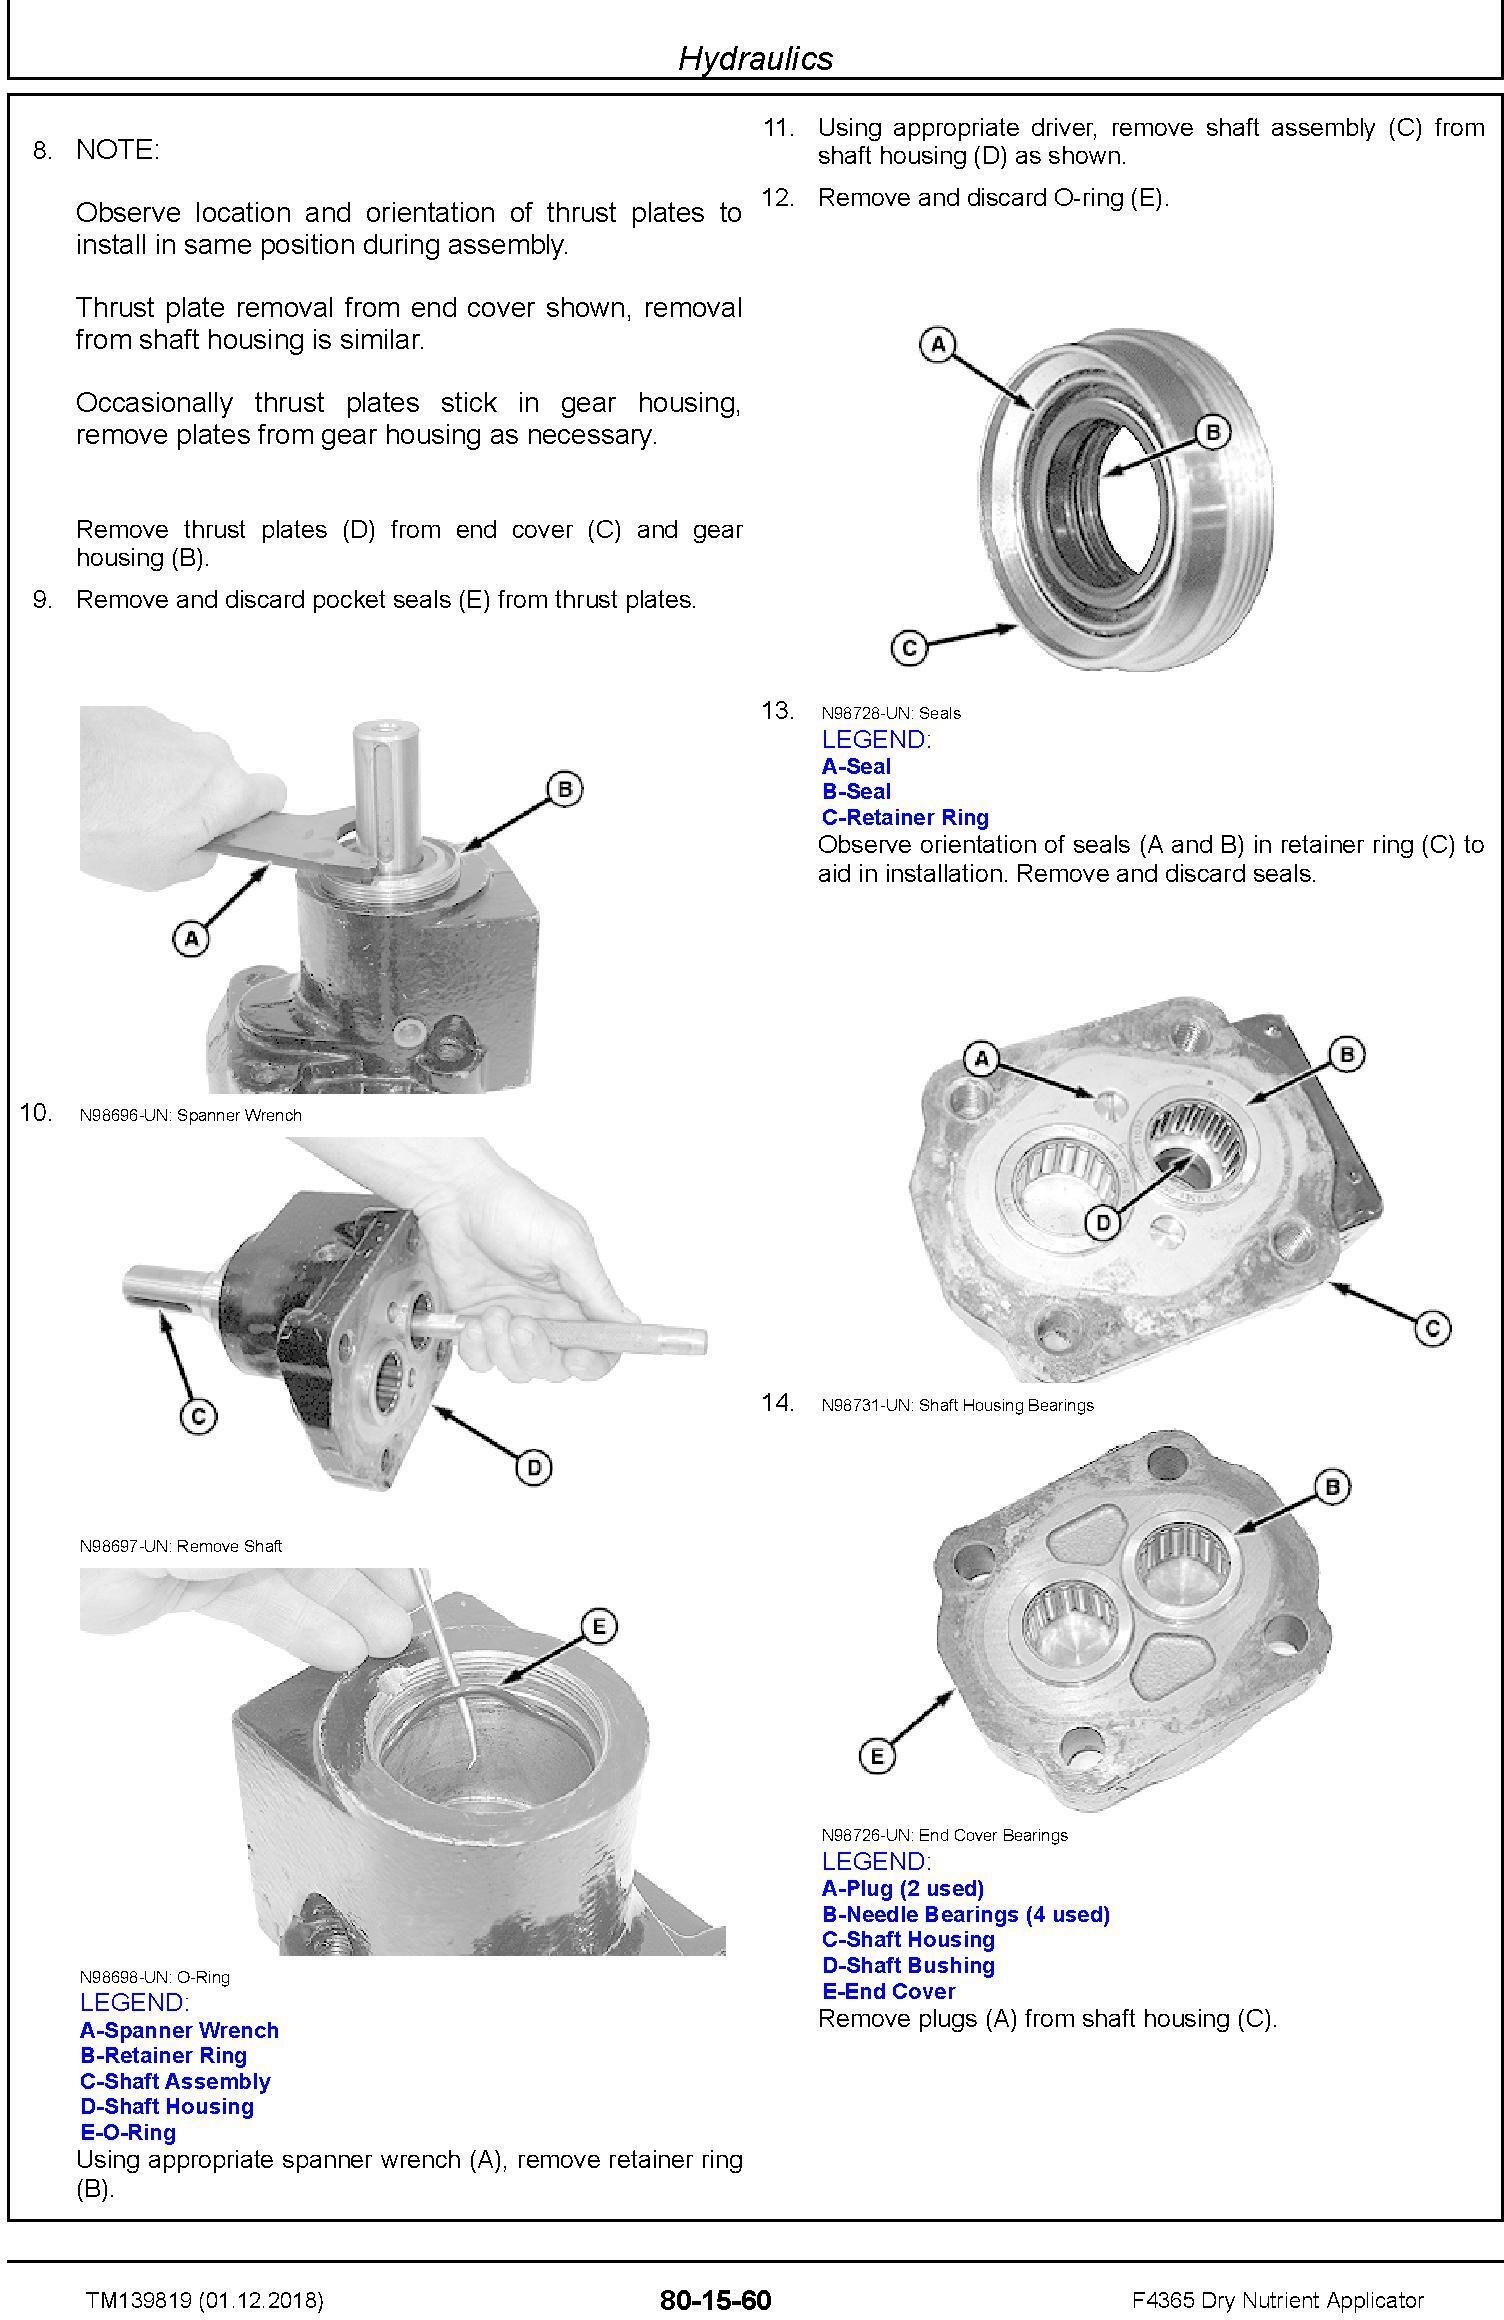 John Deere F4365 Dry Nutrient Applicator Service Repair Technical Manual (TM139819) - 2